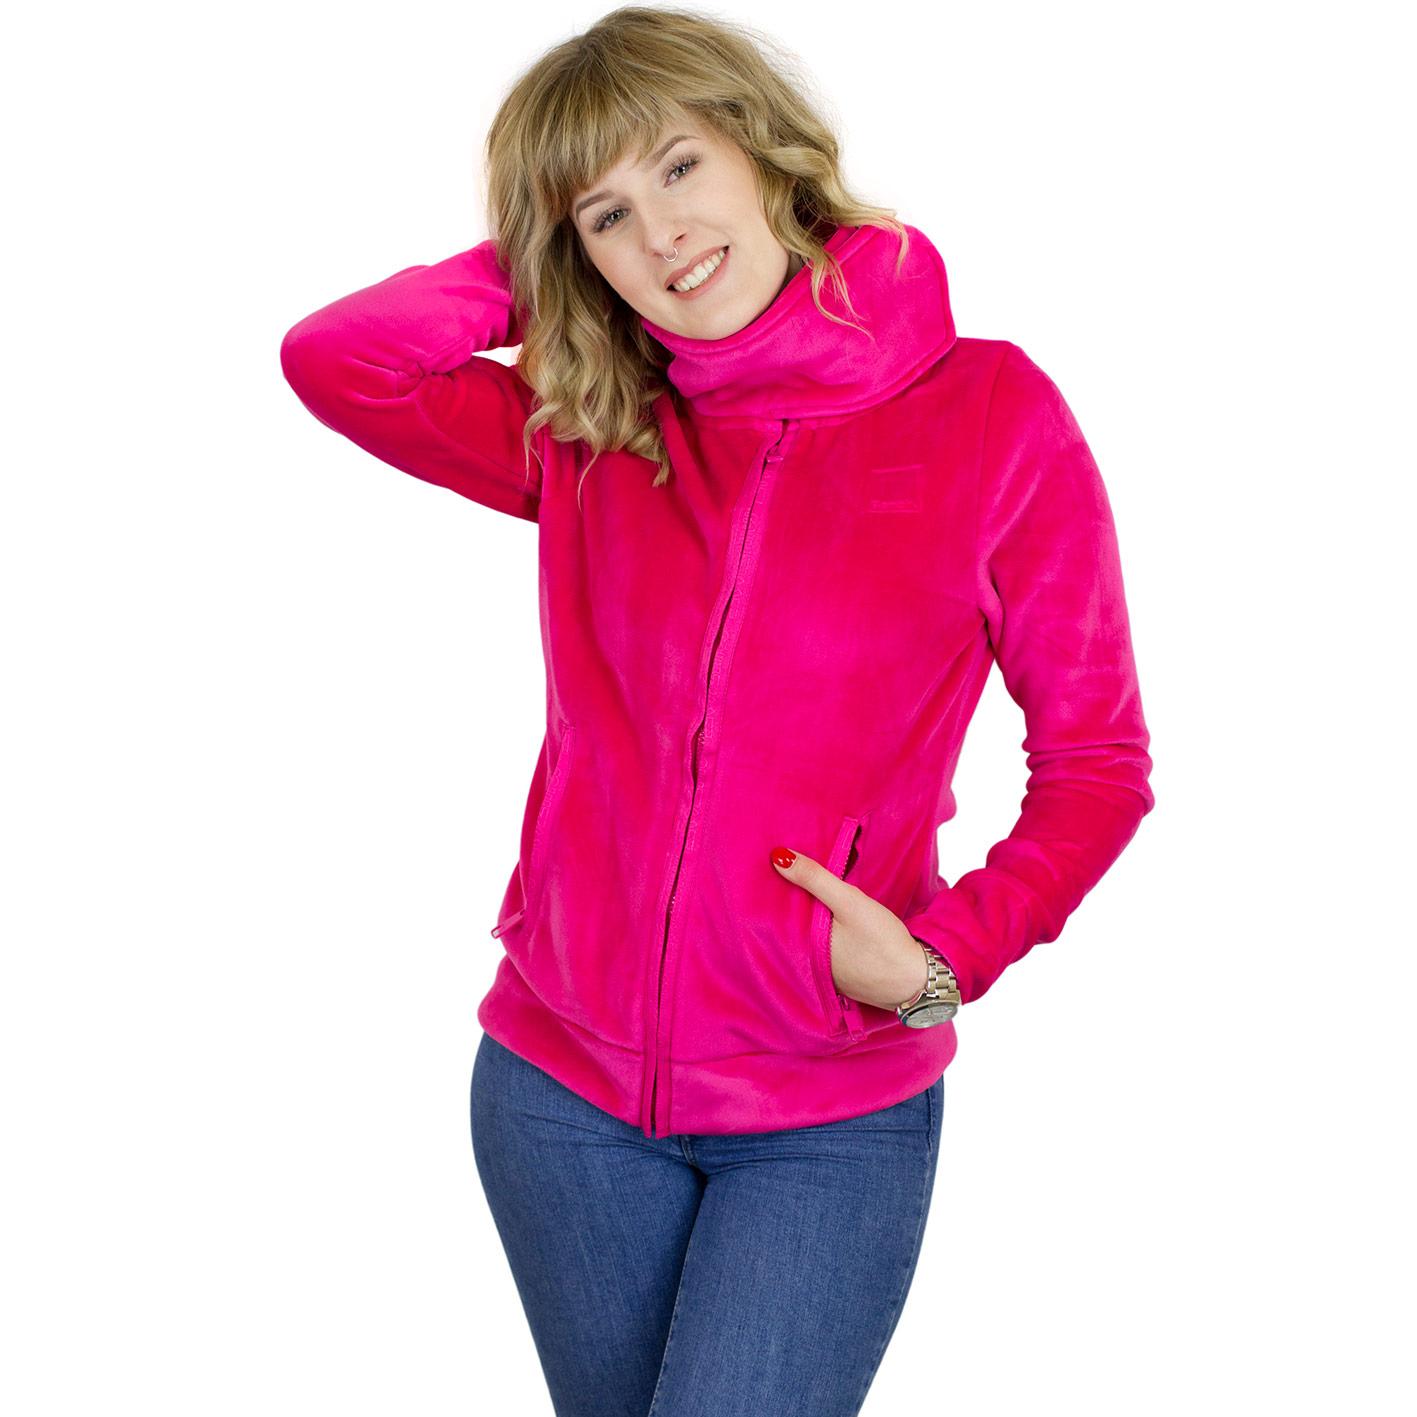 ☆ Bench Damen Sweatjacke Heritage Fleece Funnel pink hier